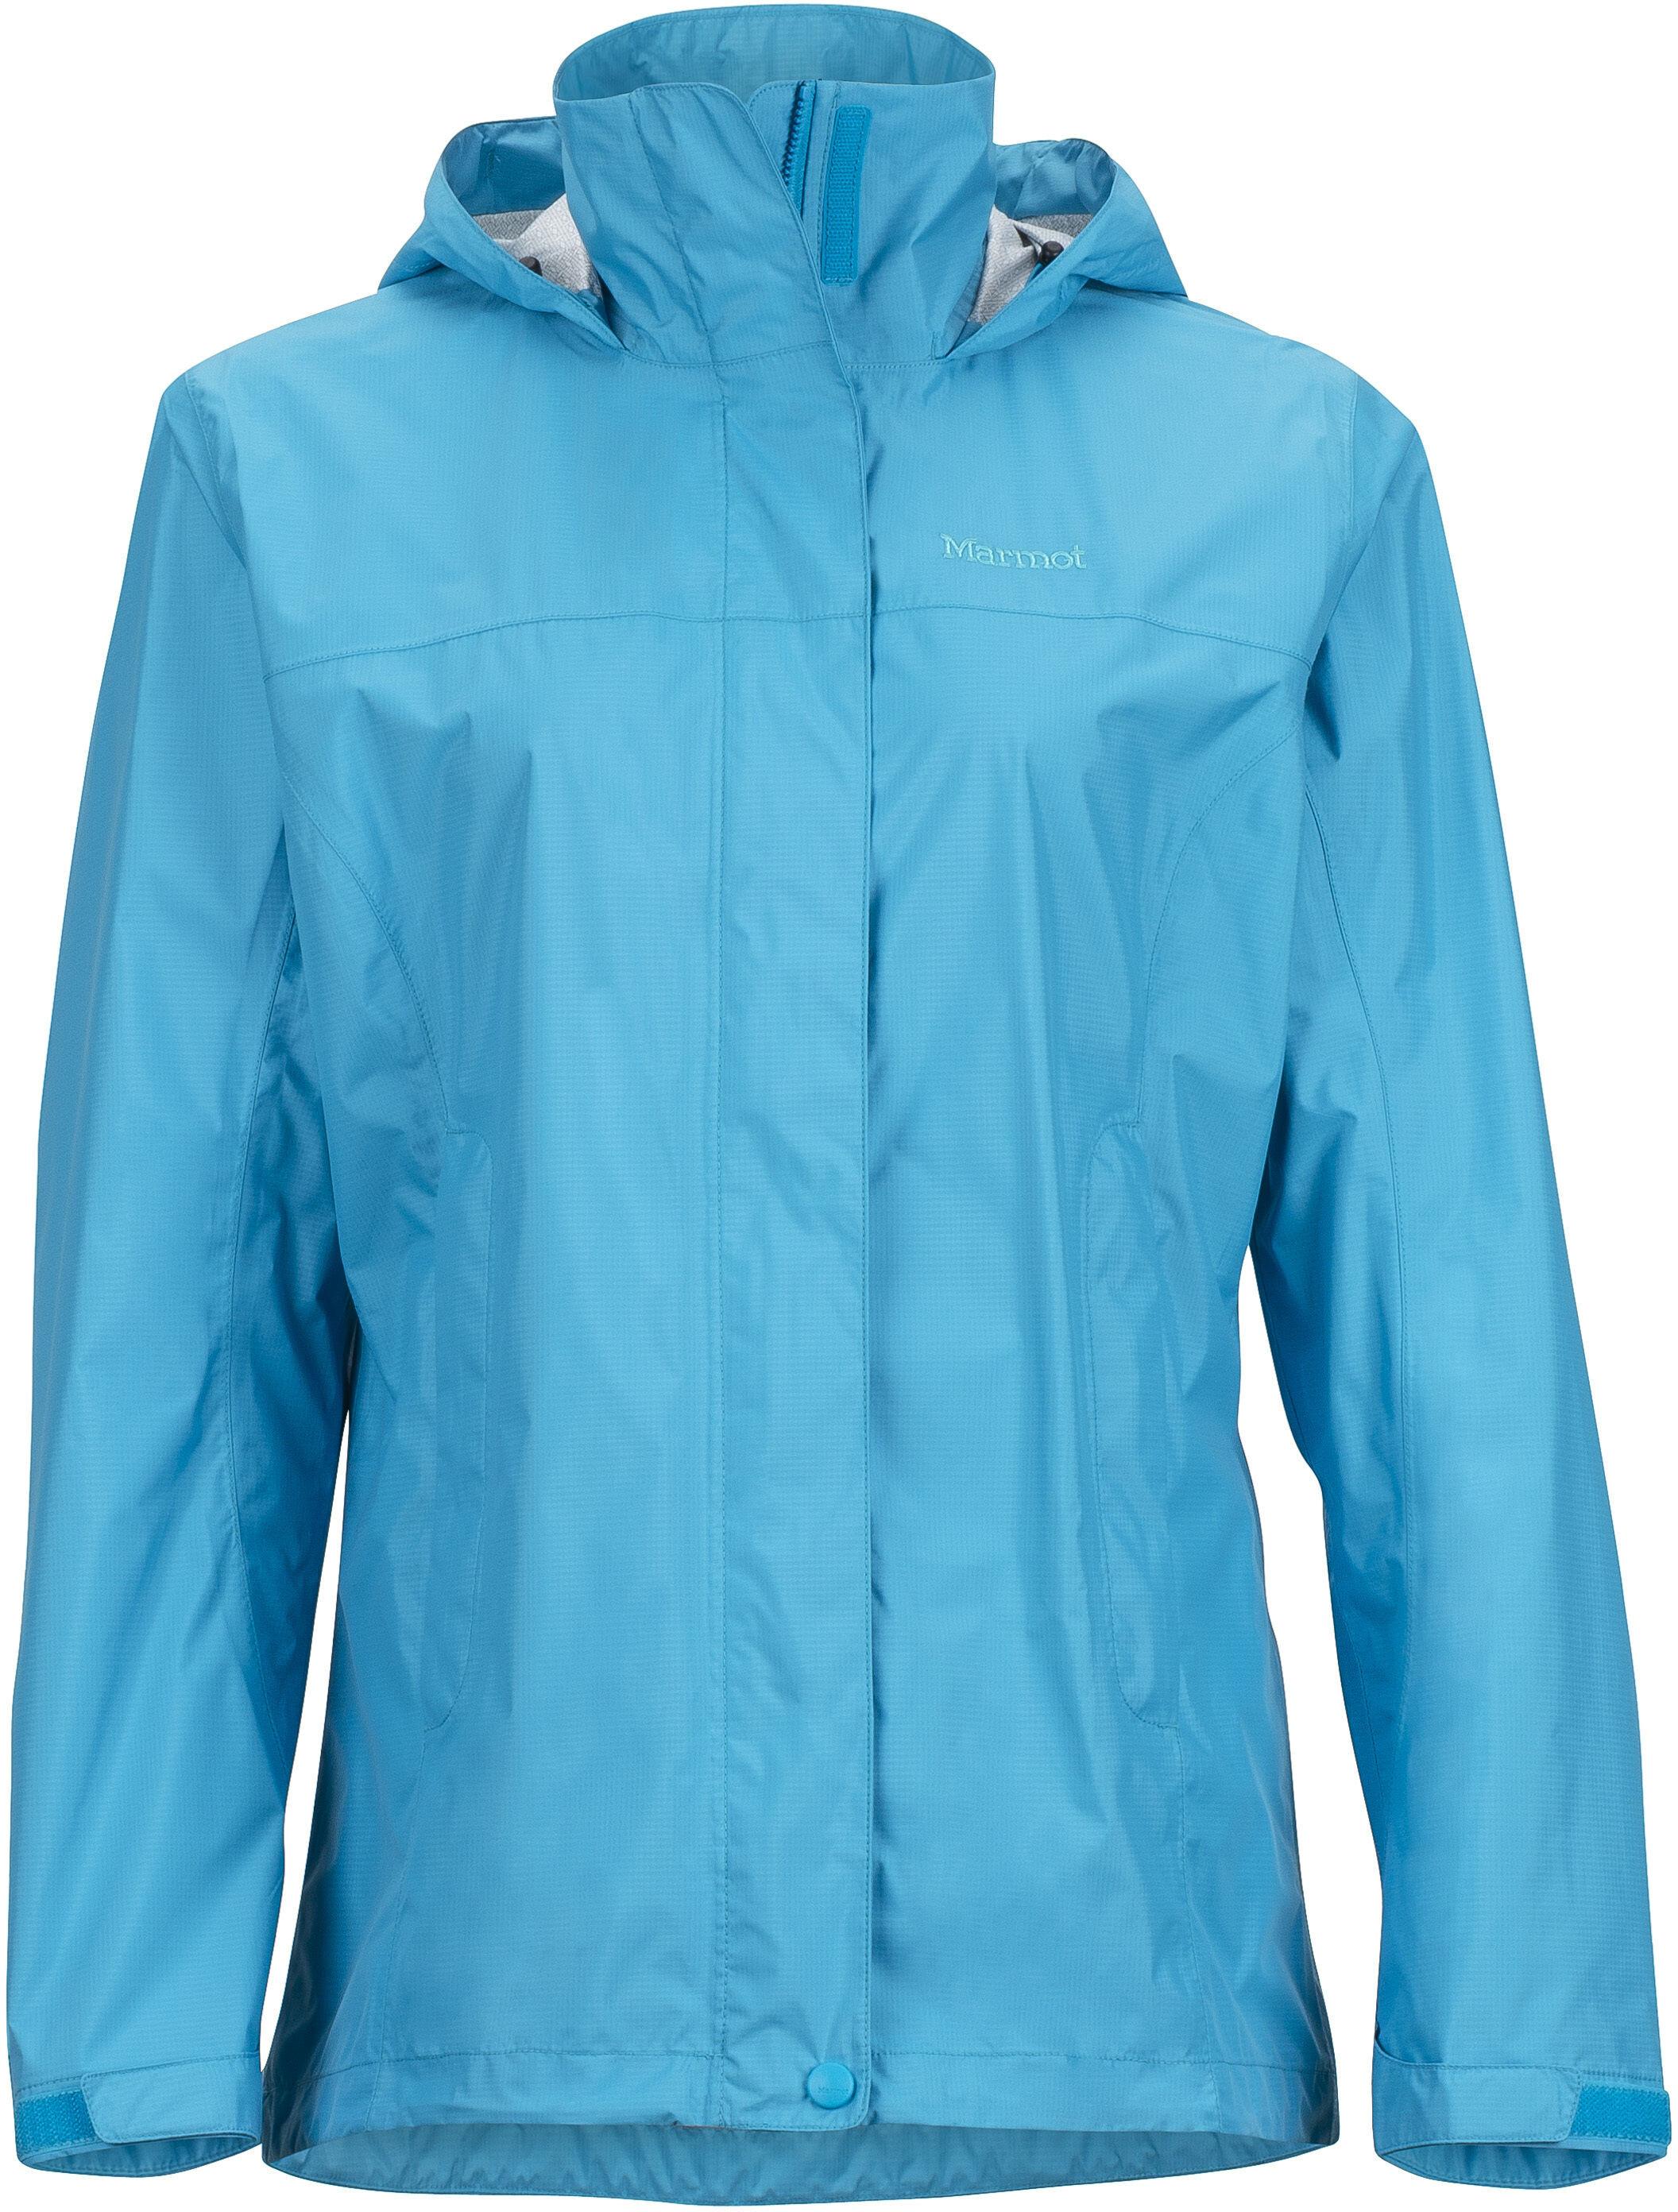 Marmot Women S Alexie Jacket: Marmot PreCip Jacket Women Blue At Addnature.co.uk